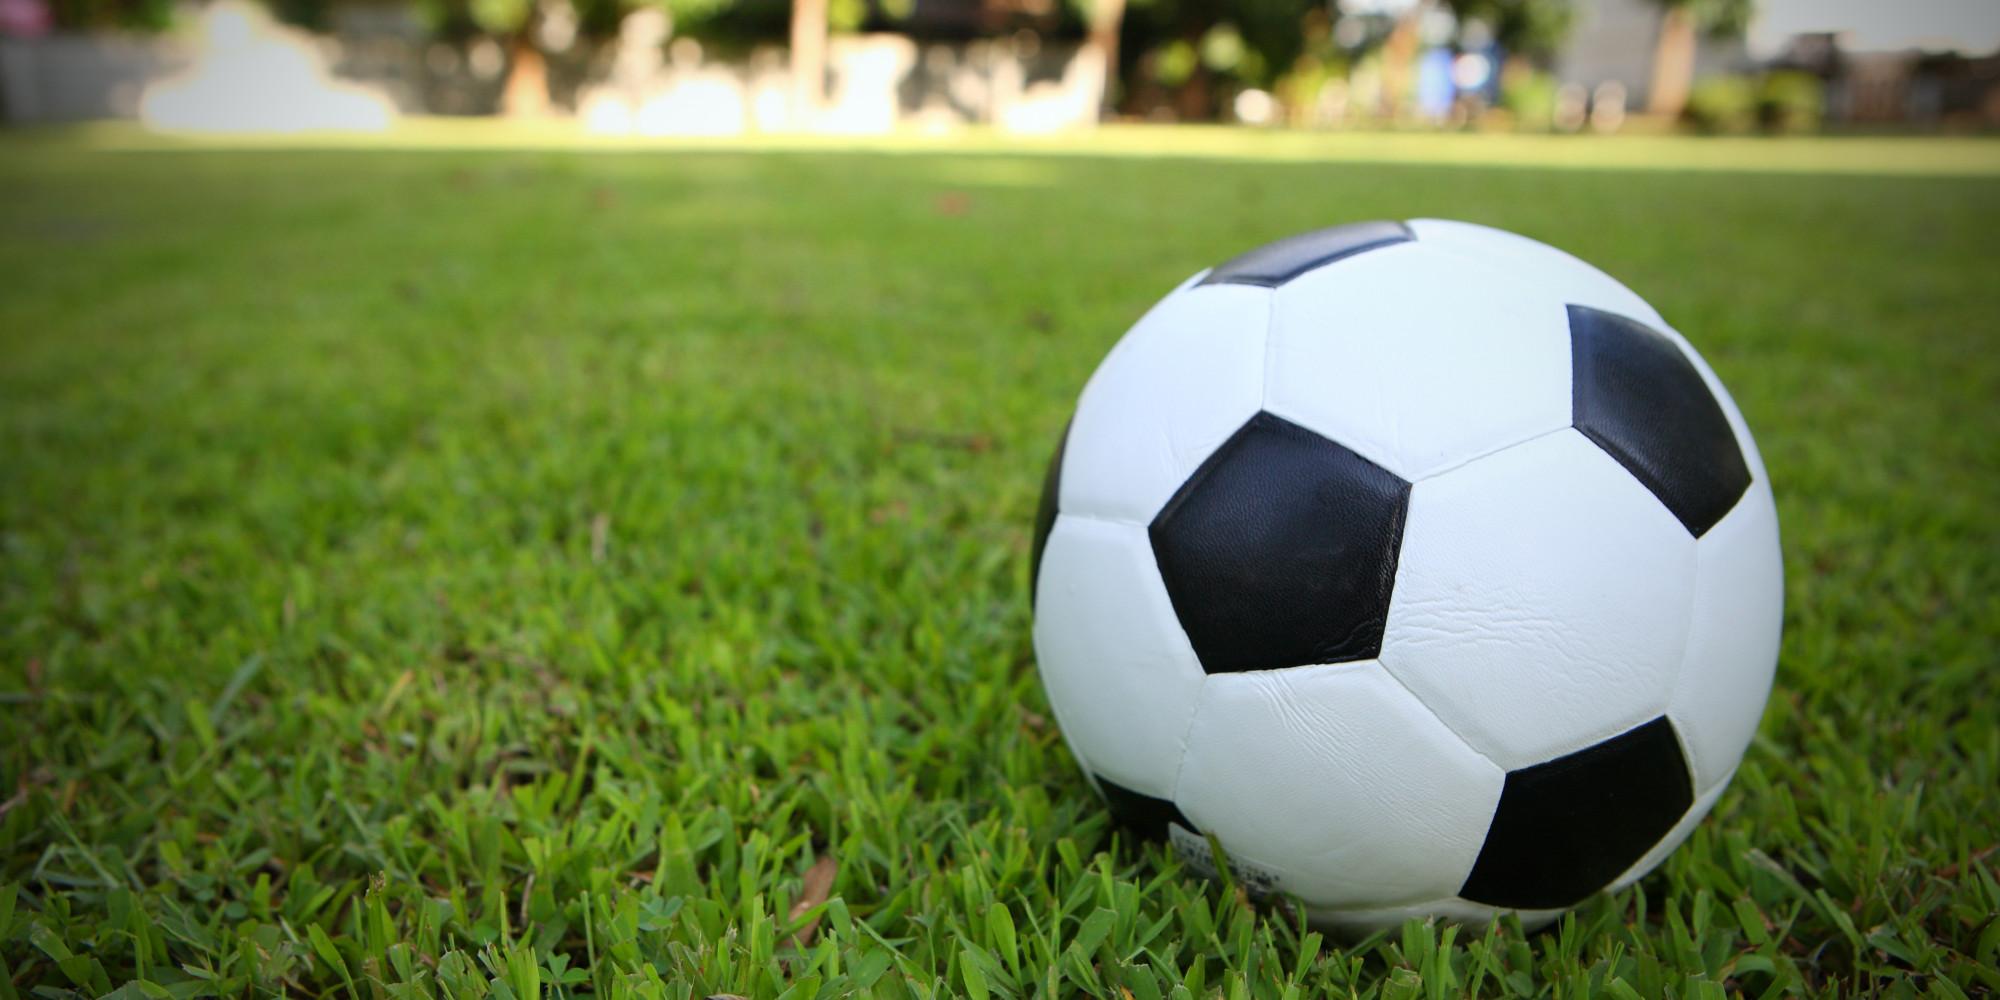 Score For The Cure 3v3 Soccer Tournament - UVM Bored